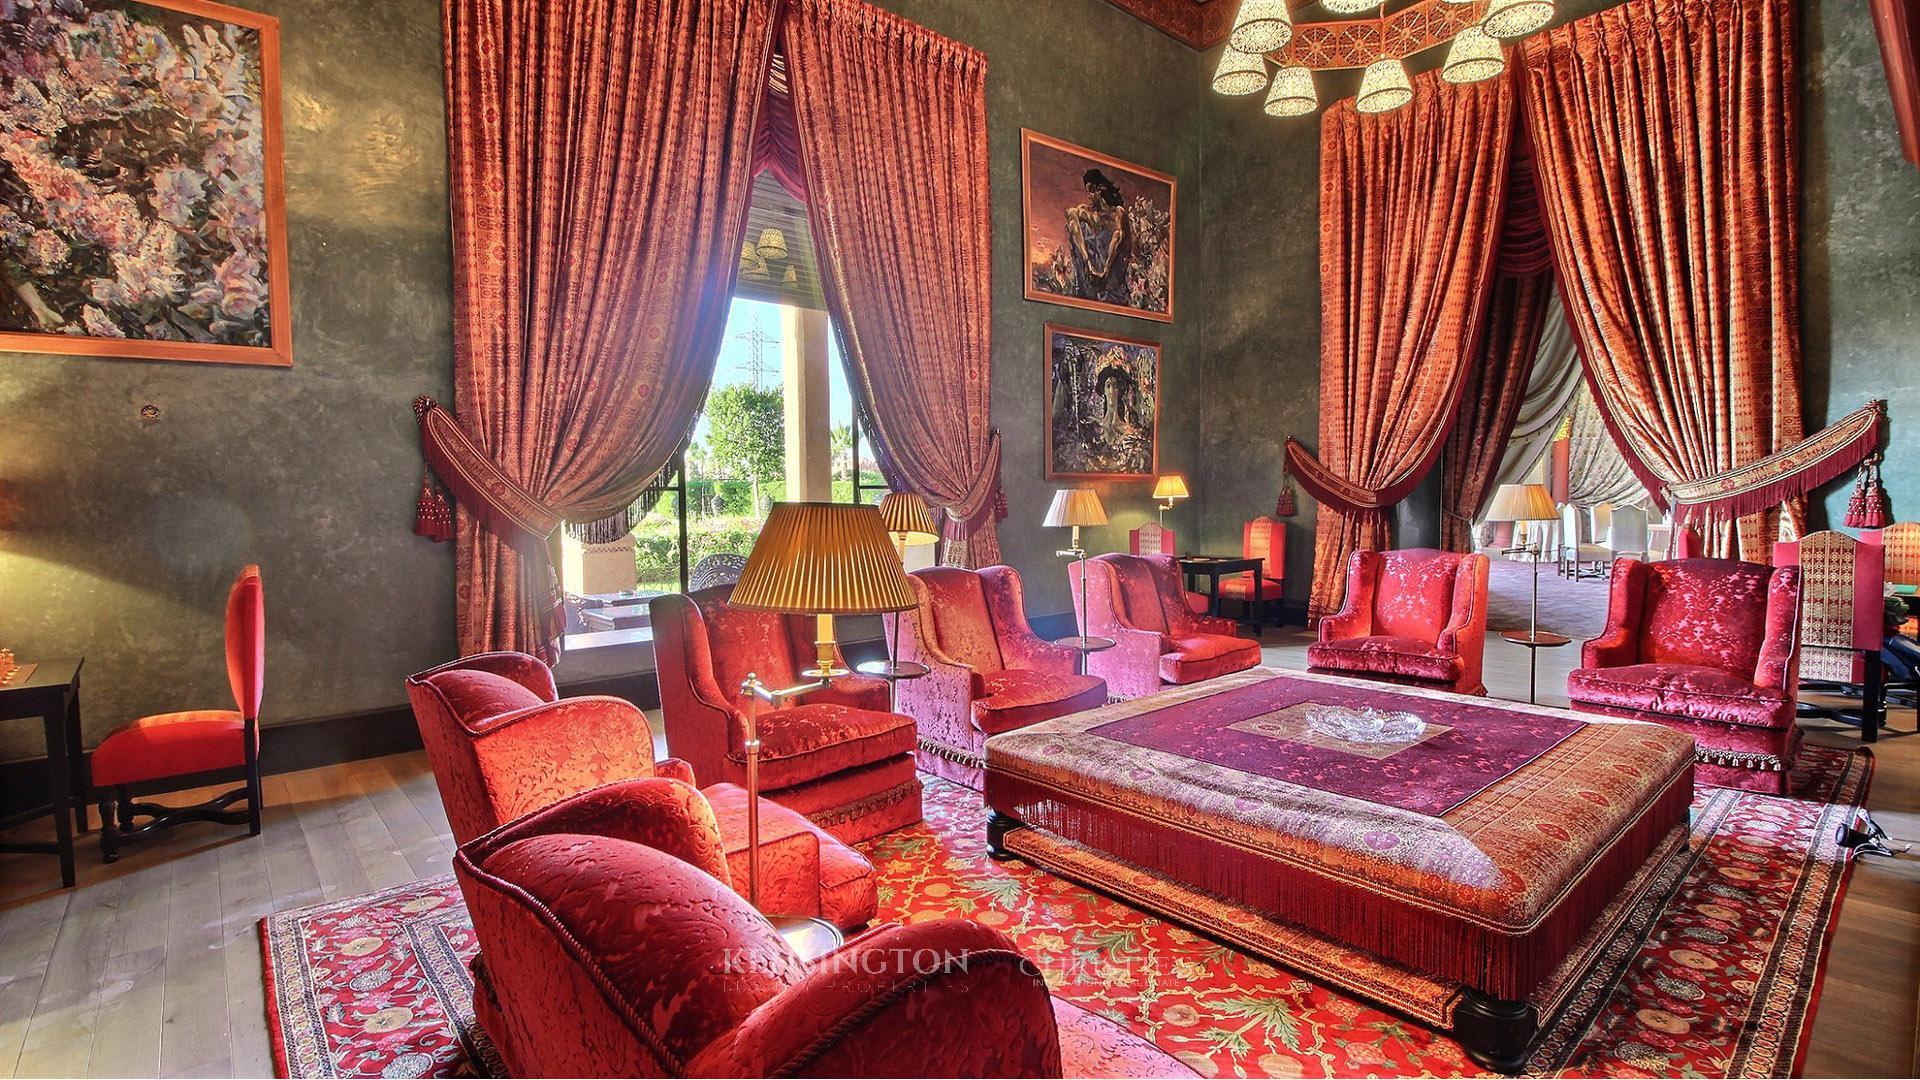 KPPM00912: Palais Granada Villa de luxe Marrakech Maroc